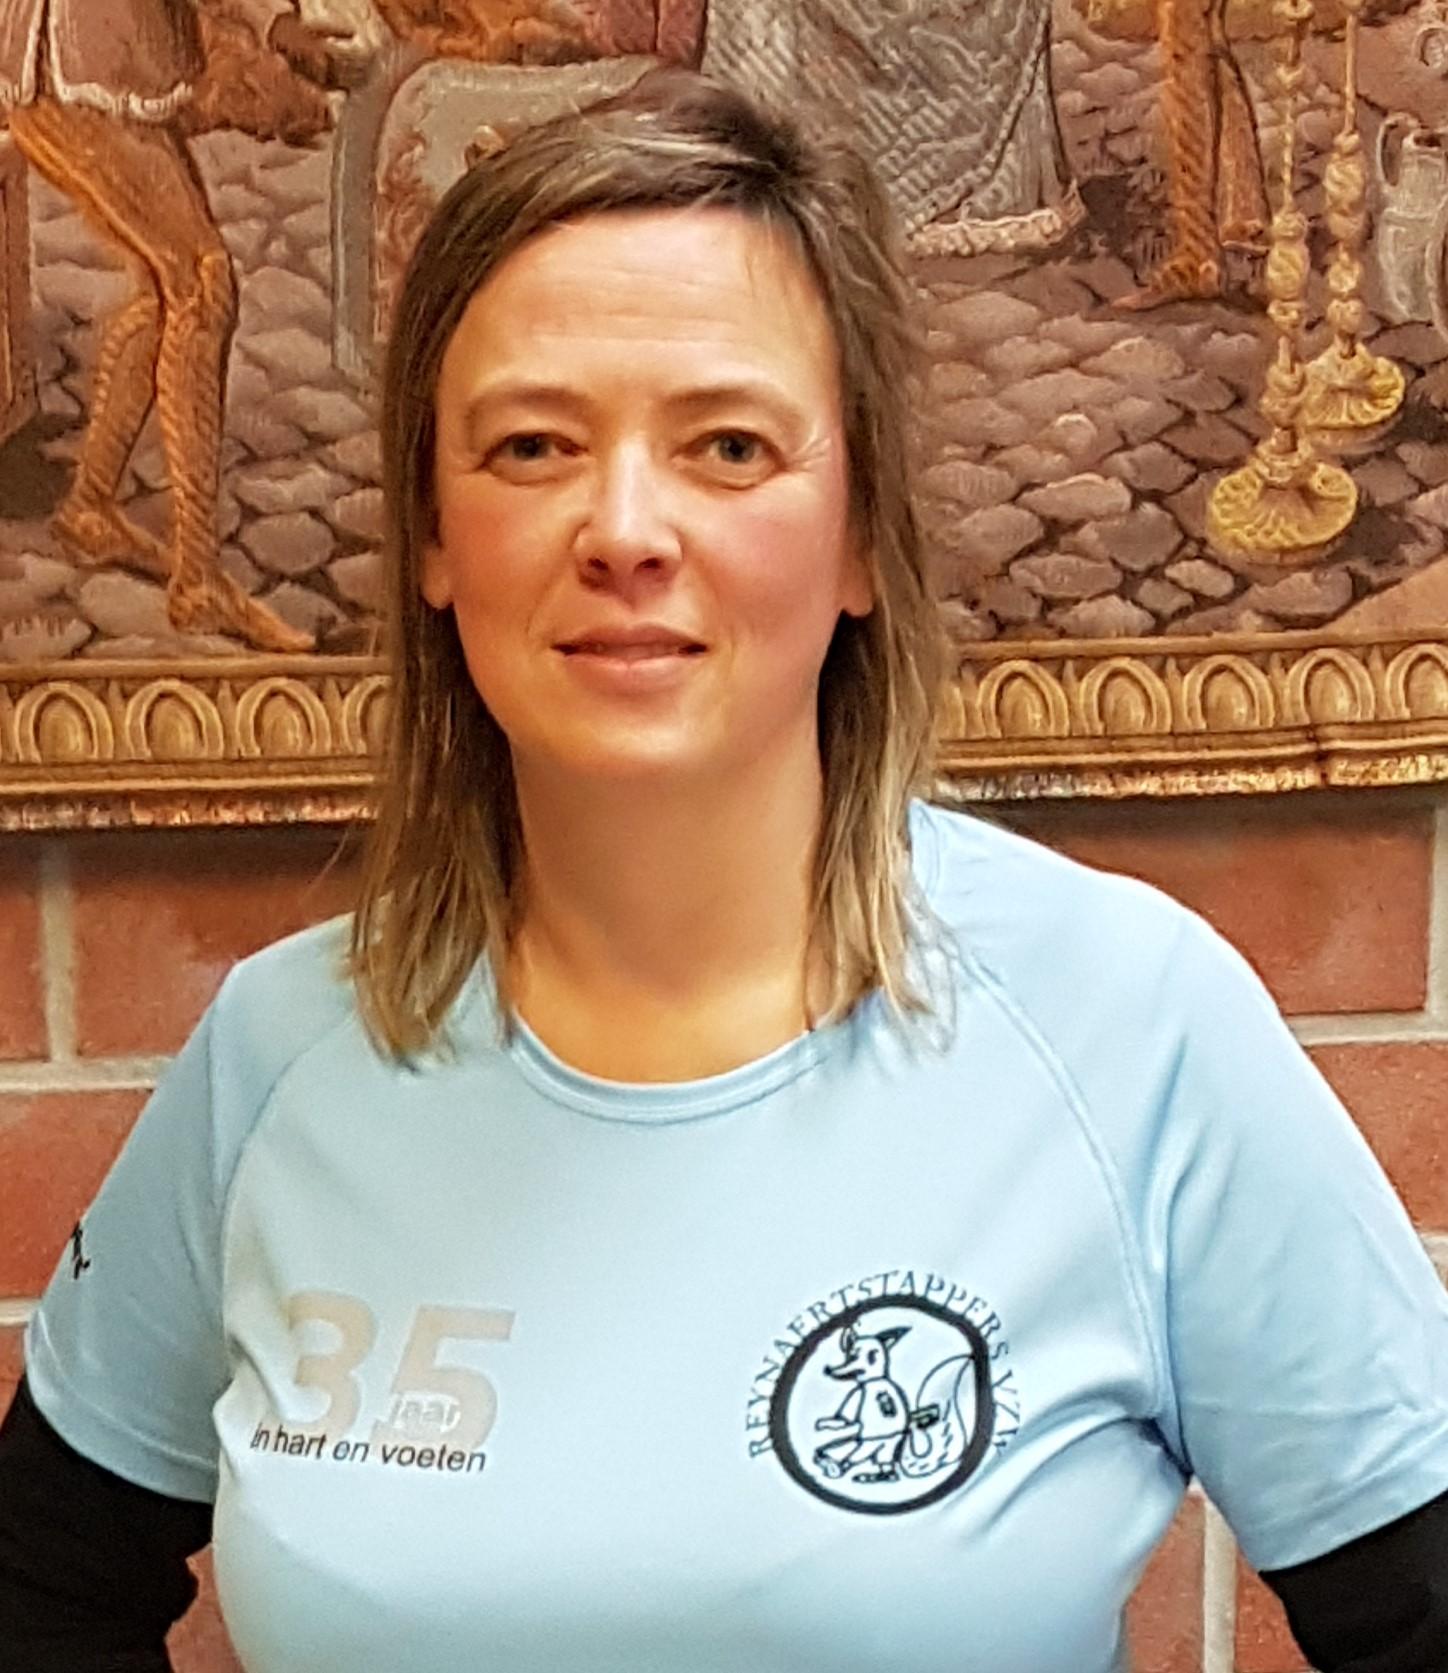 Marcia Van Meervenne